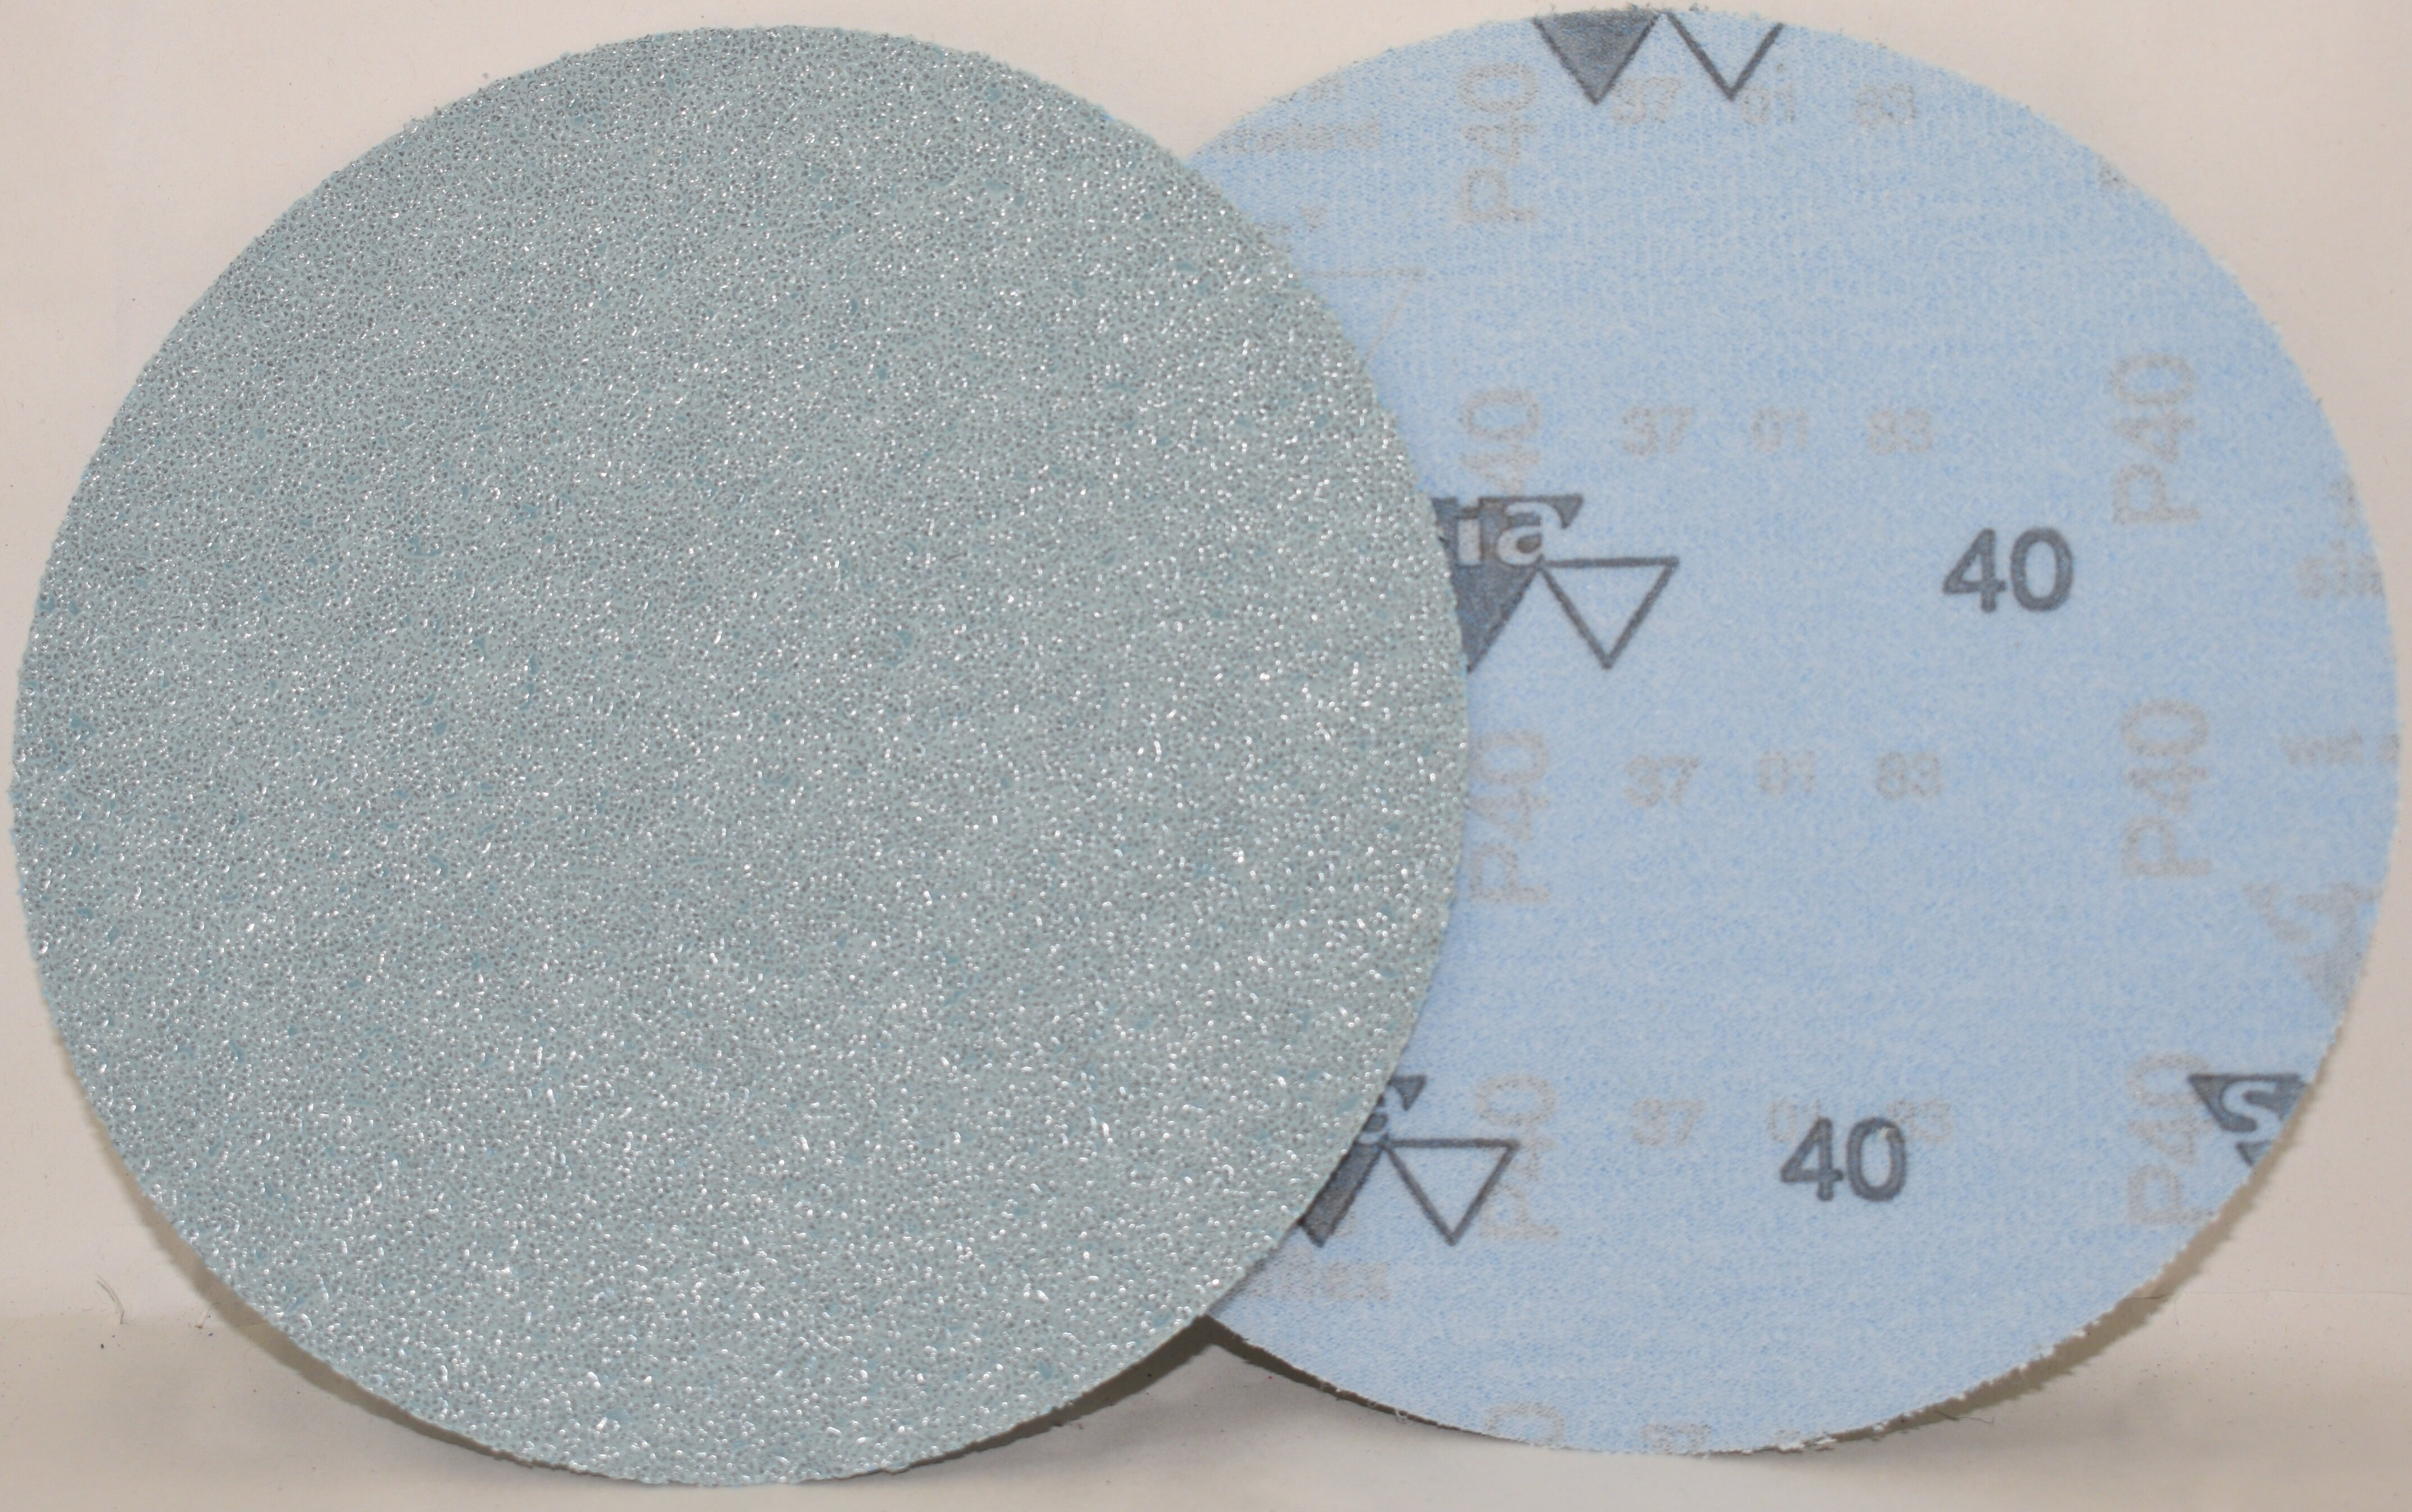 SIAFLEX 1948 150mm P150 Velcro Disc